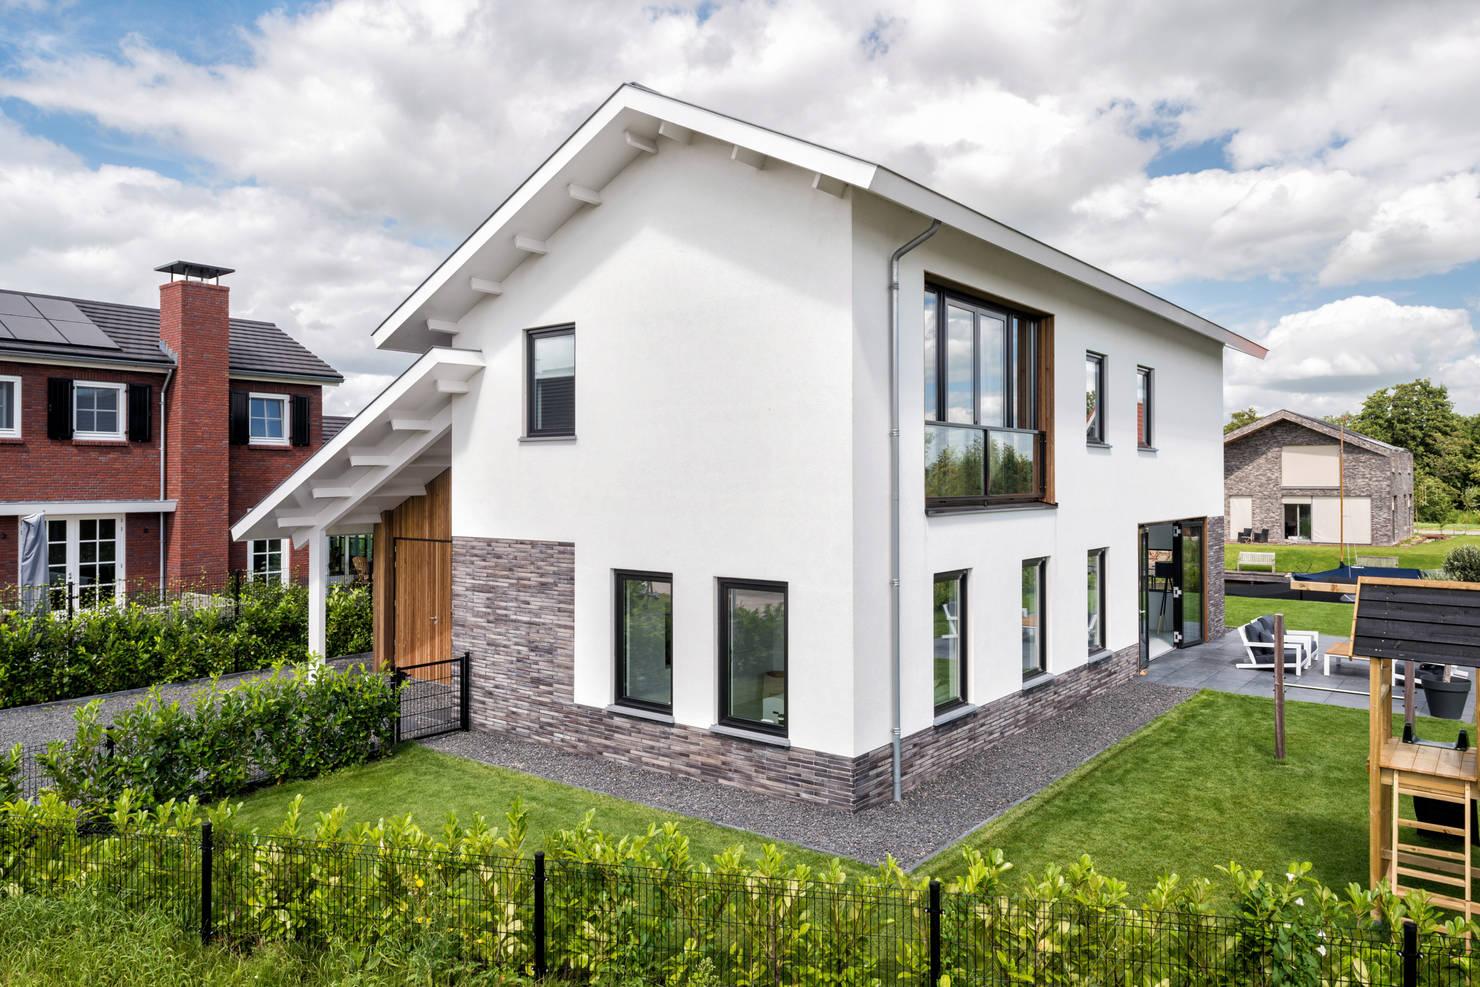 30 fachadas de pedra para criar casas encantadoras